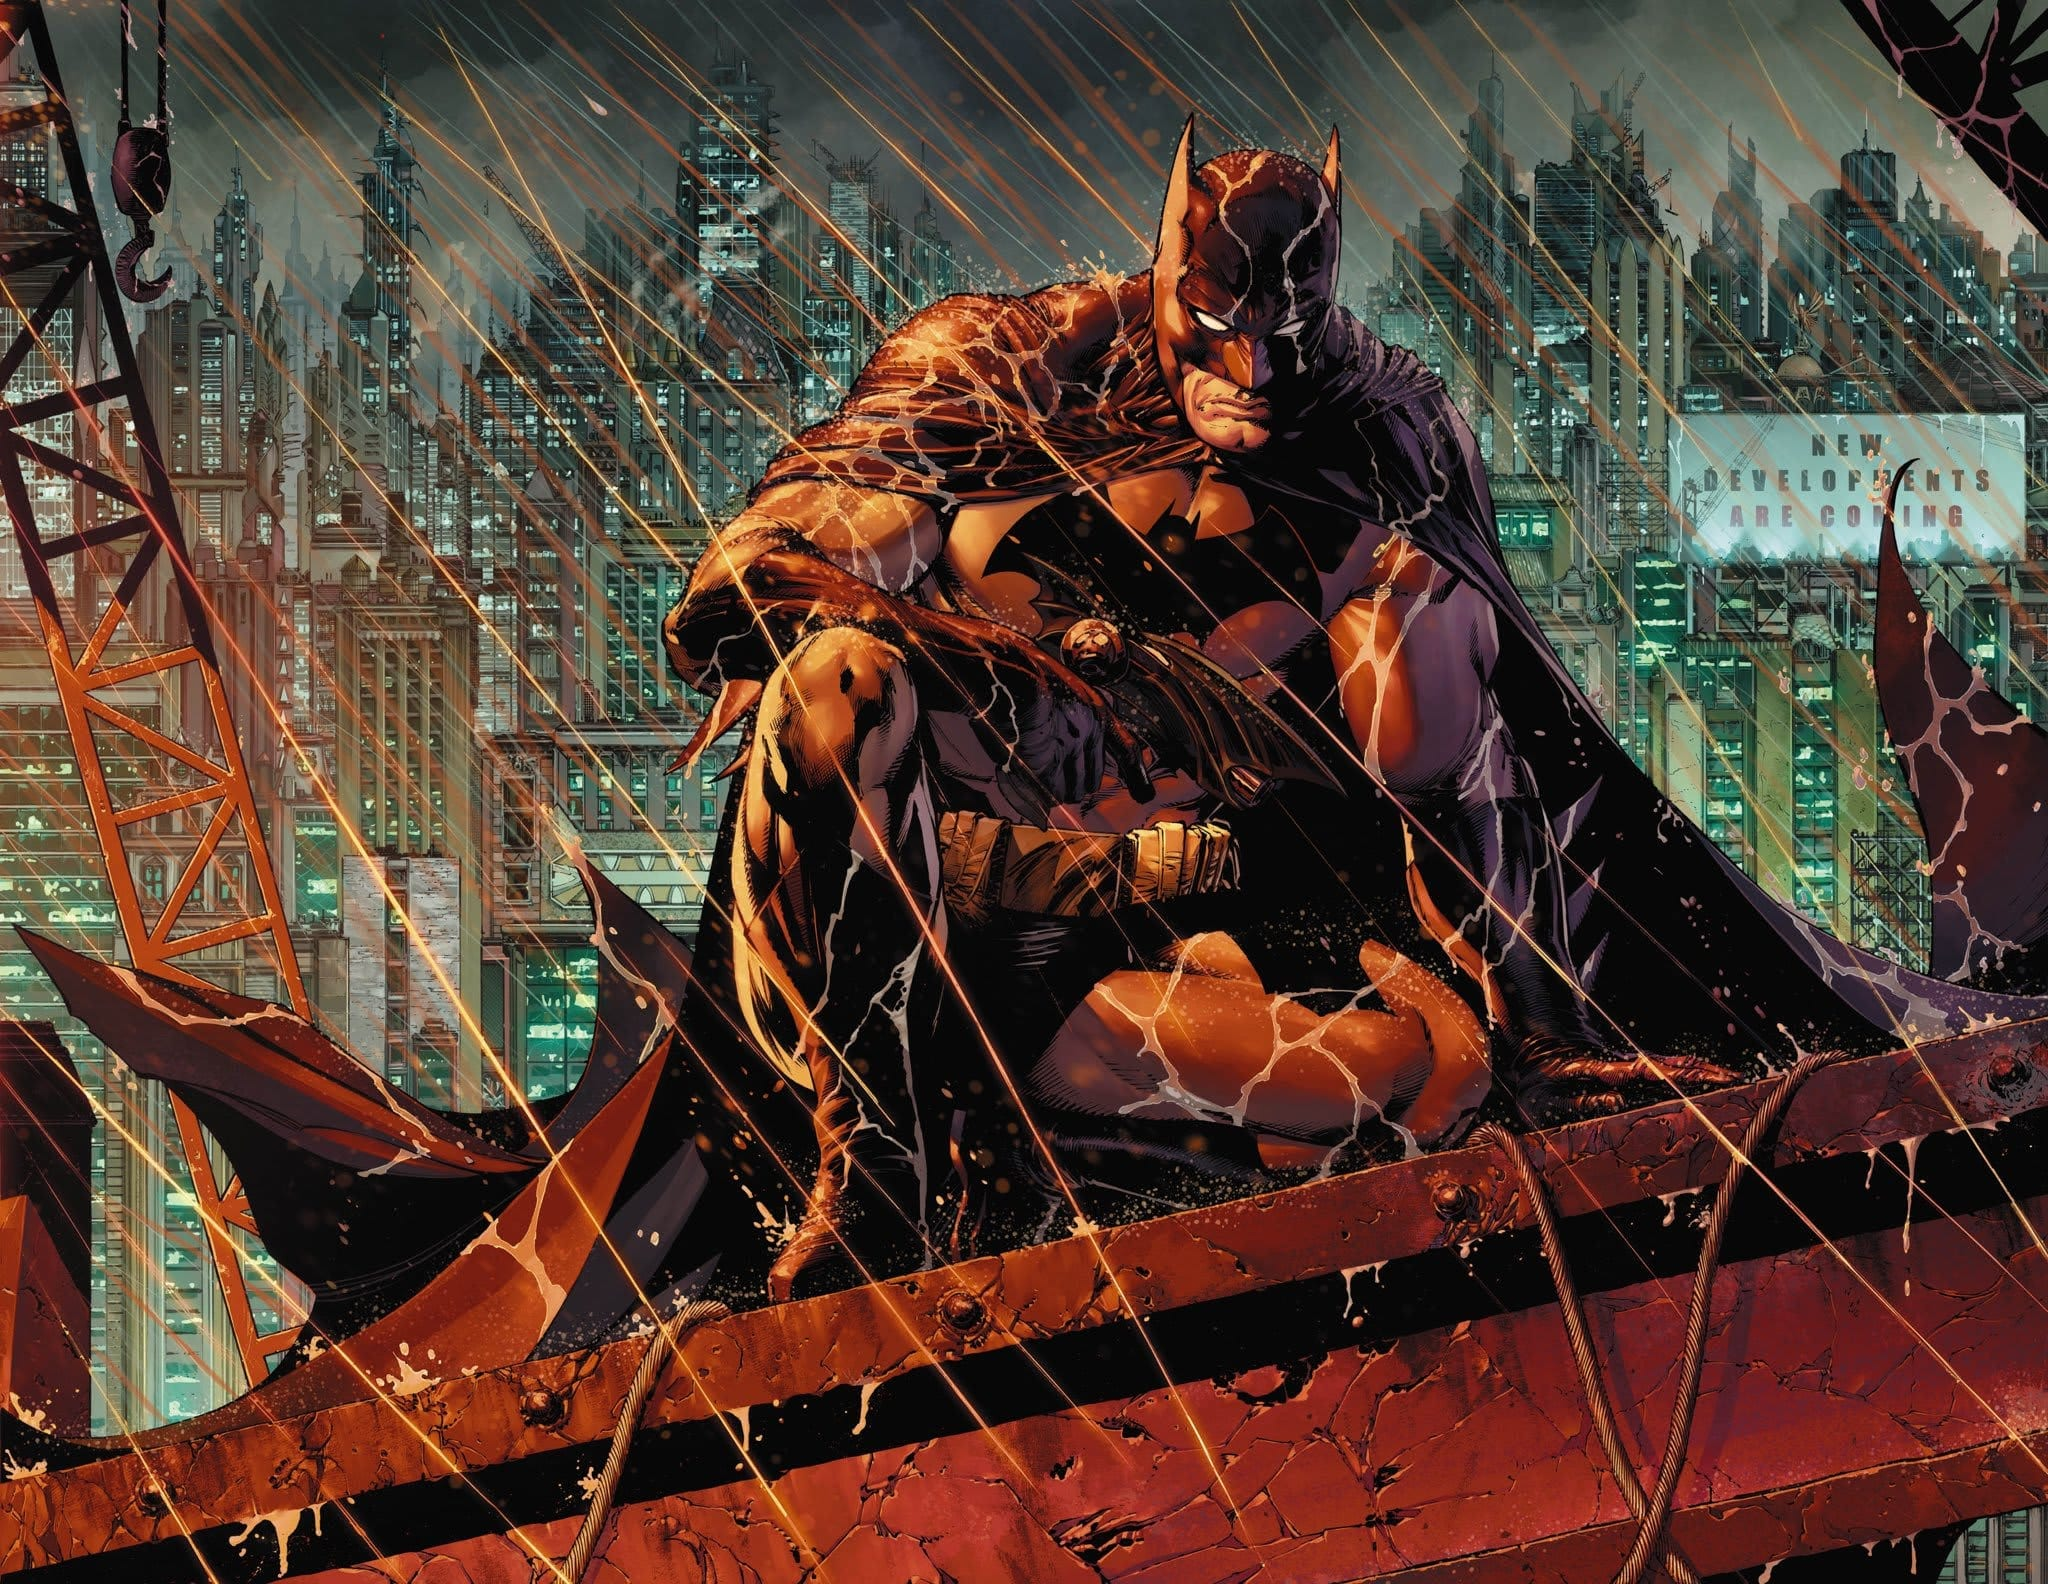 Tynion's Batman